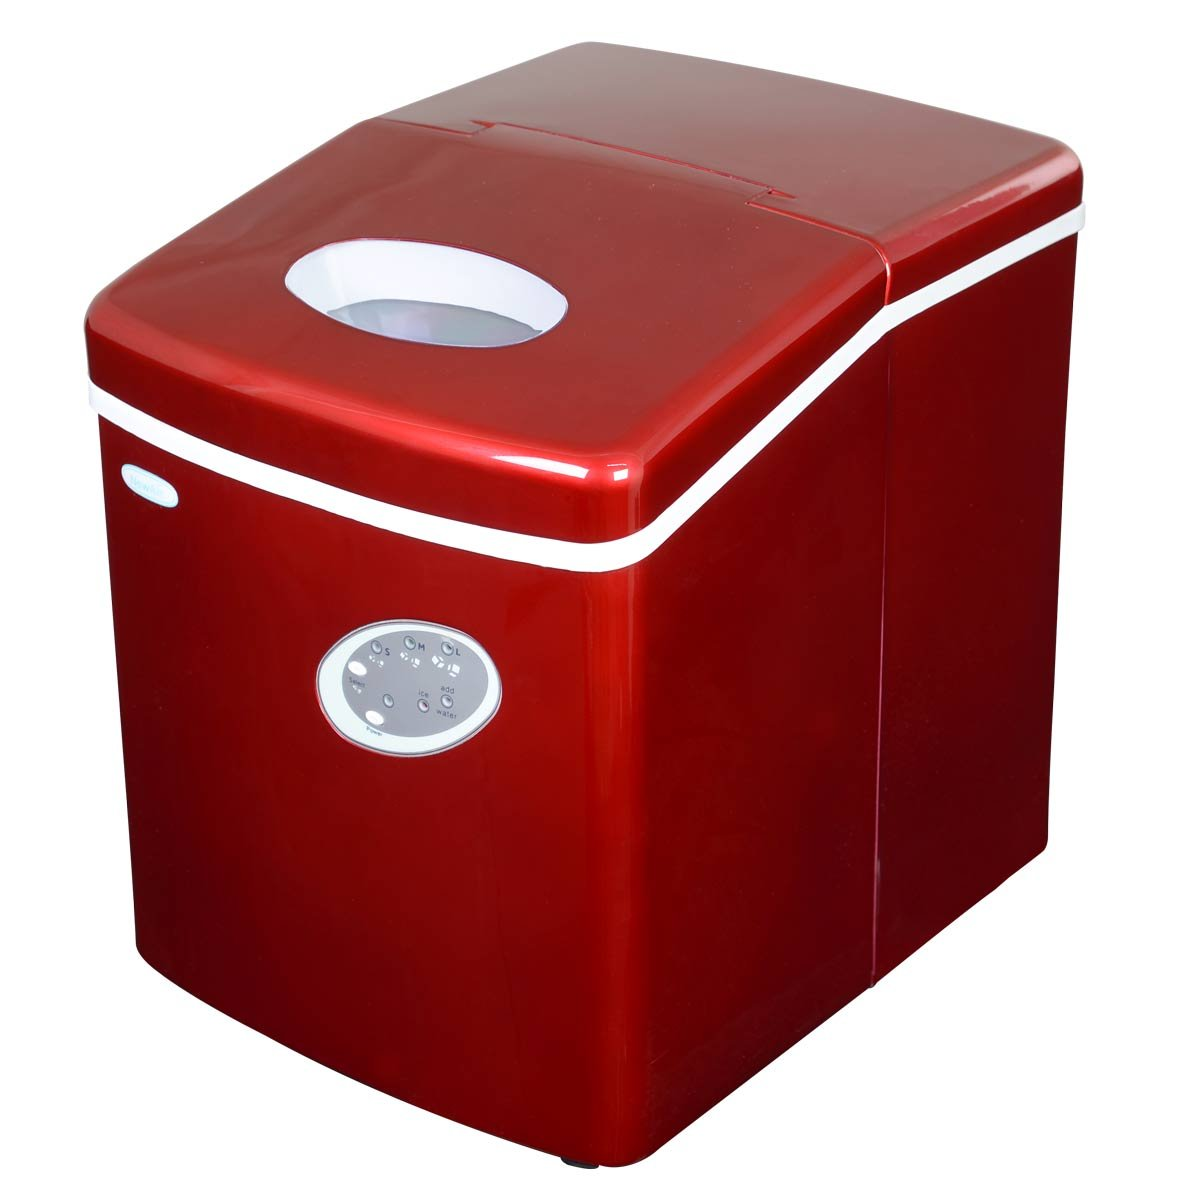 NewAir 28-lb Ice Maker